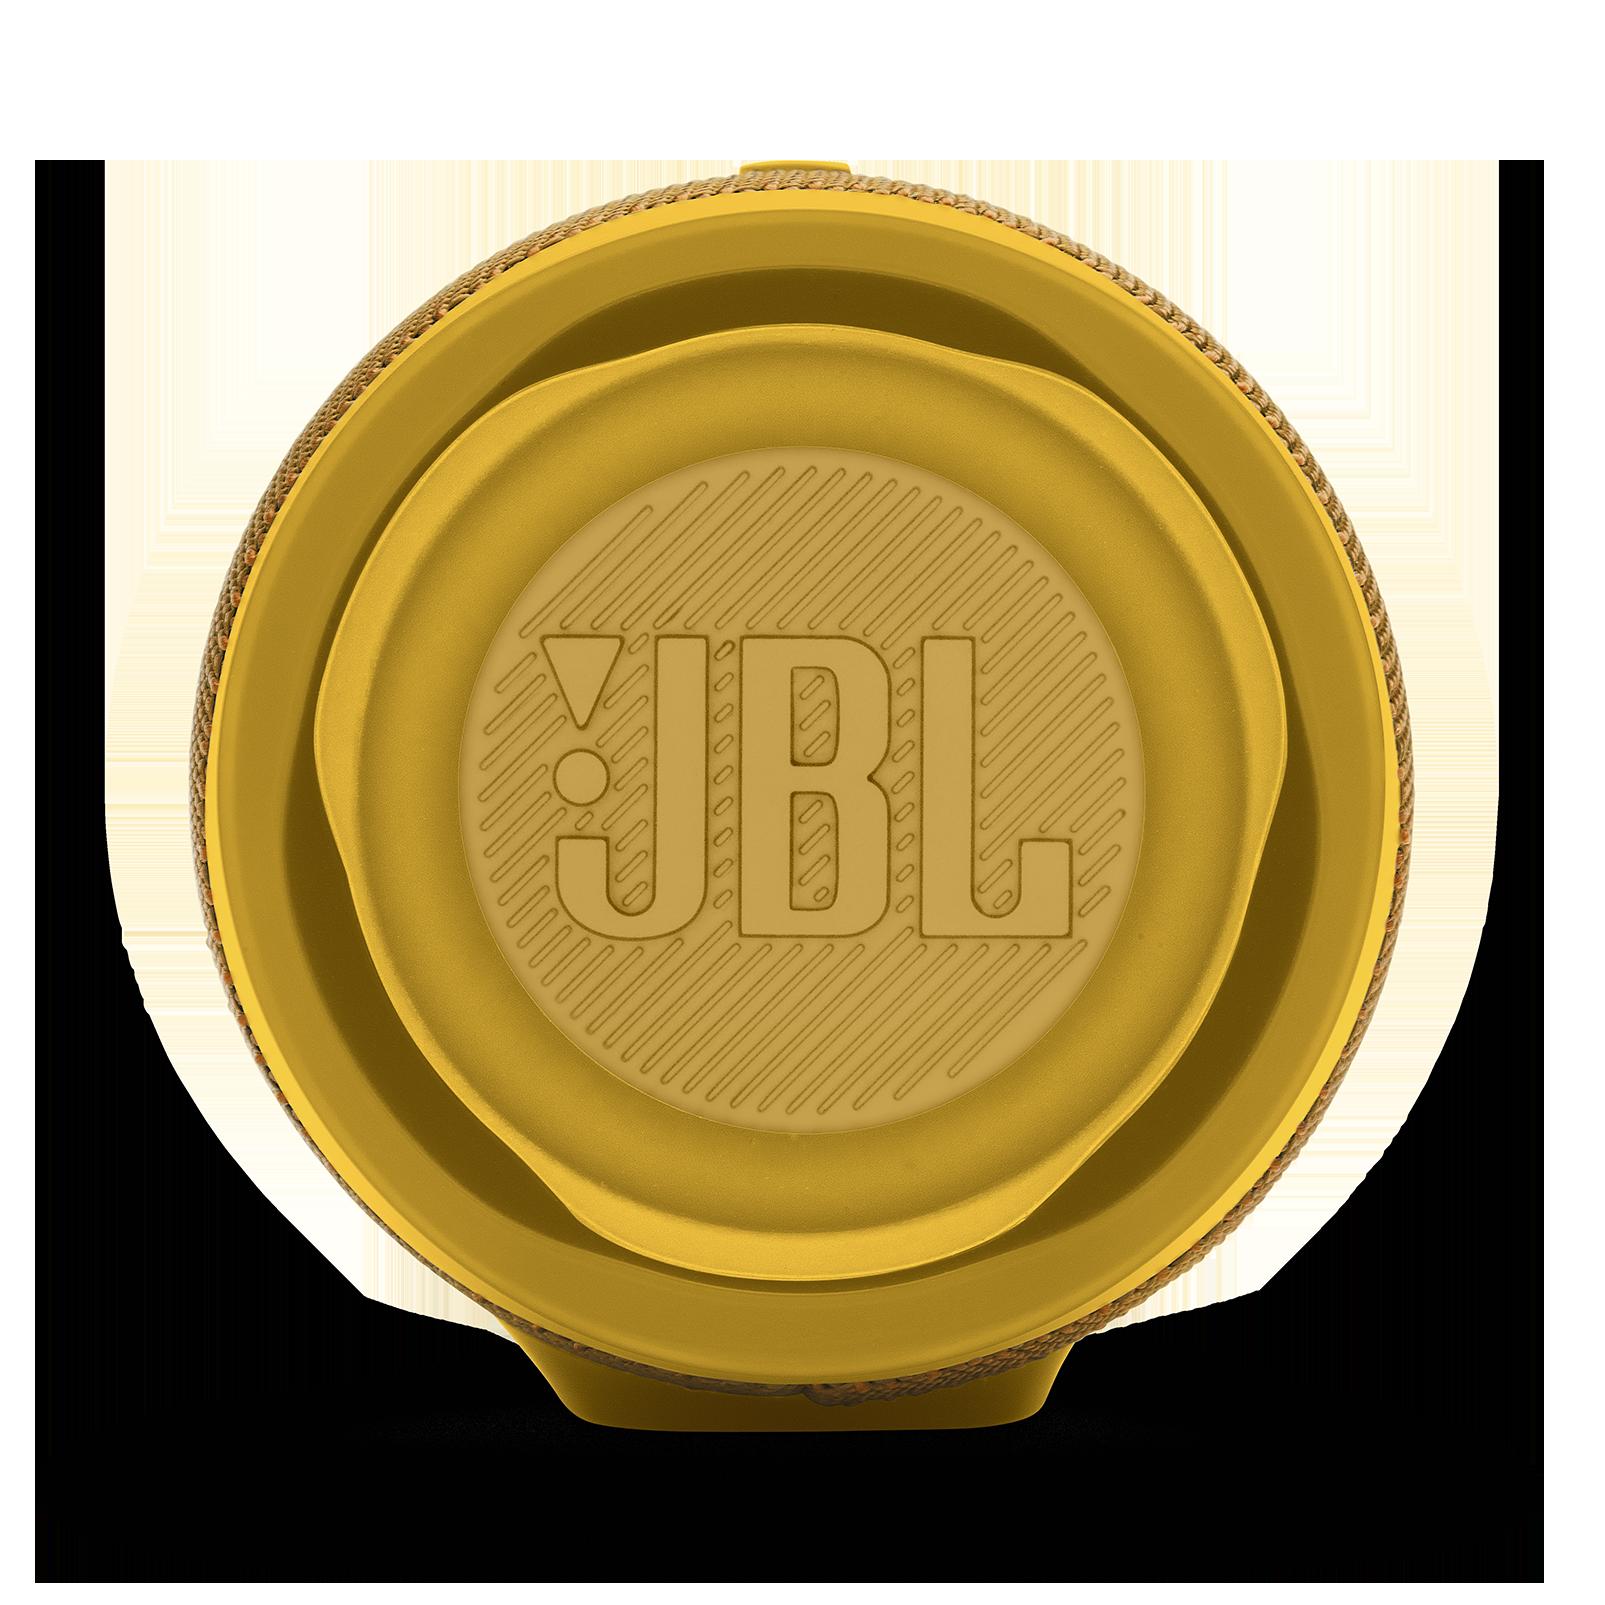 JBL Charge 4 - Mustard Yellow - Portable Bluetooth speaker - Detailshot 2